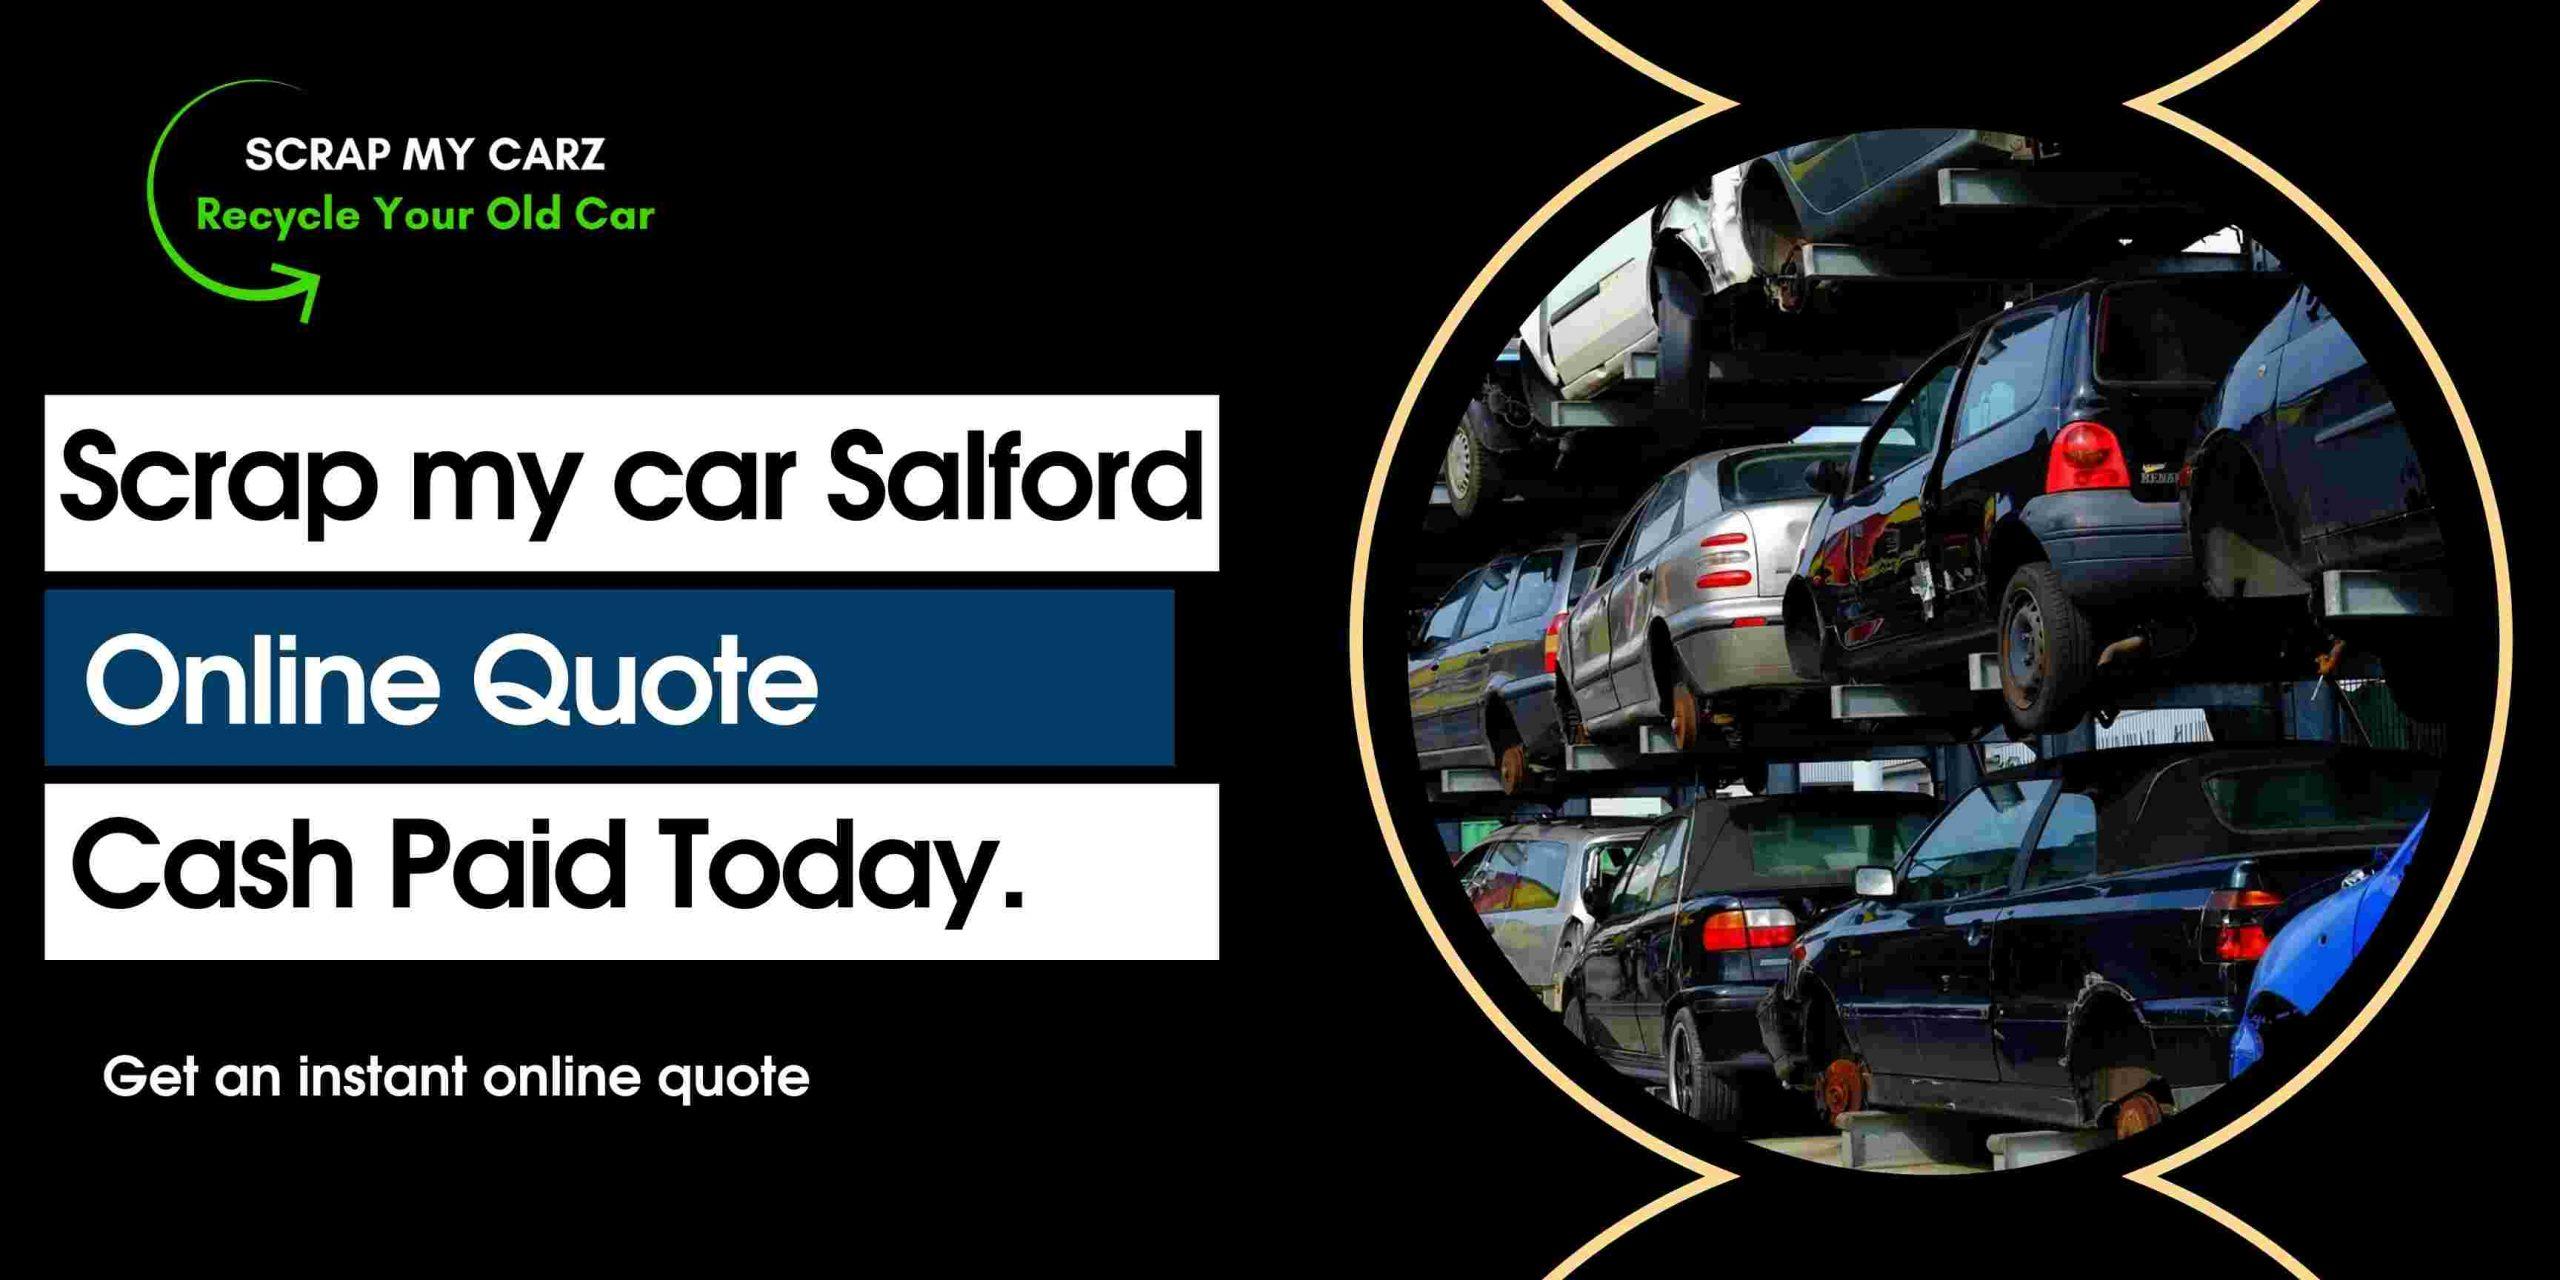 Scrap my car Salford cash today